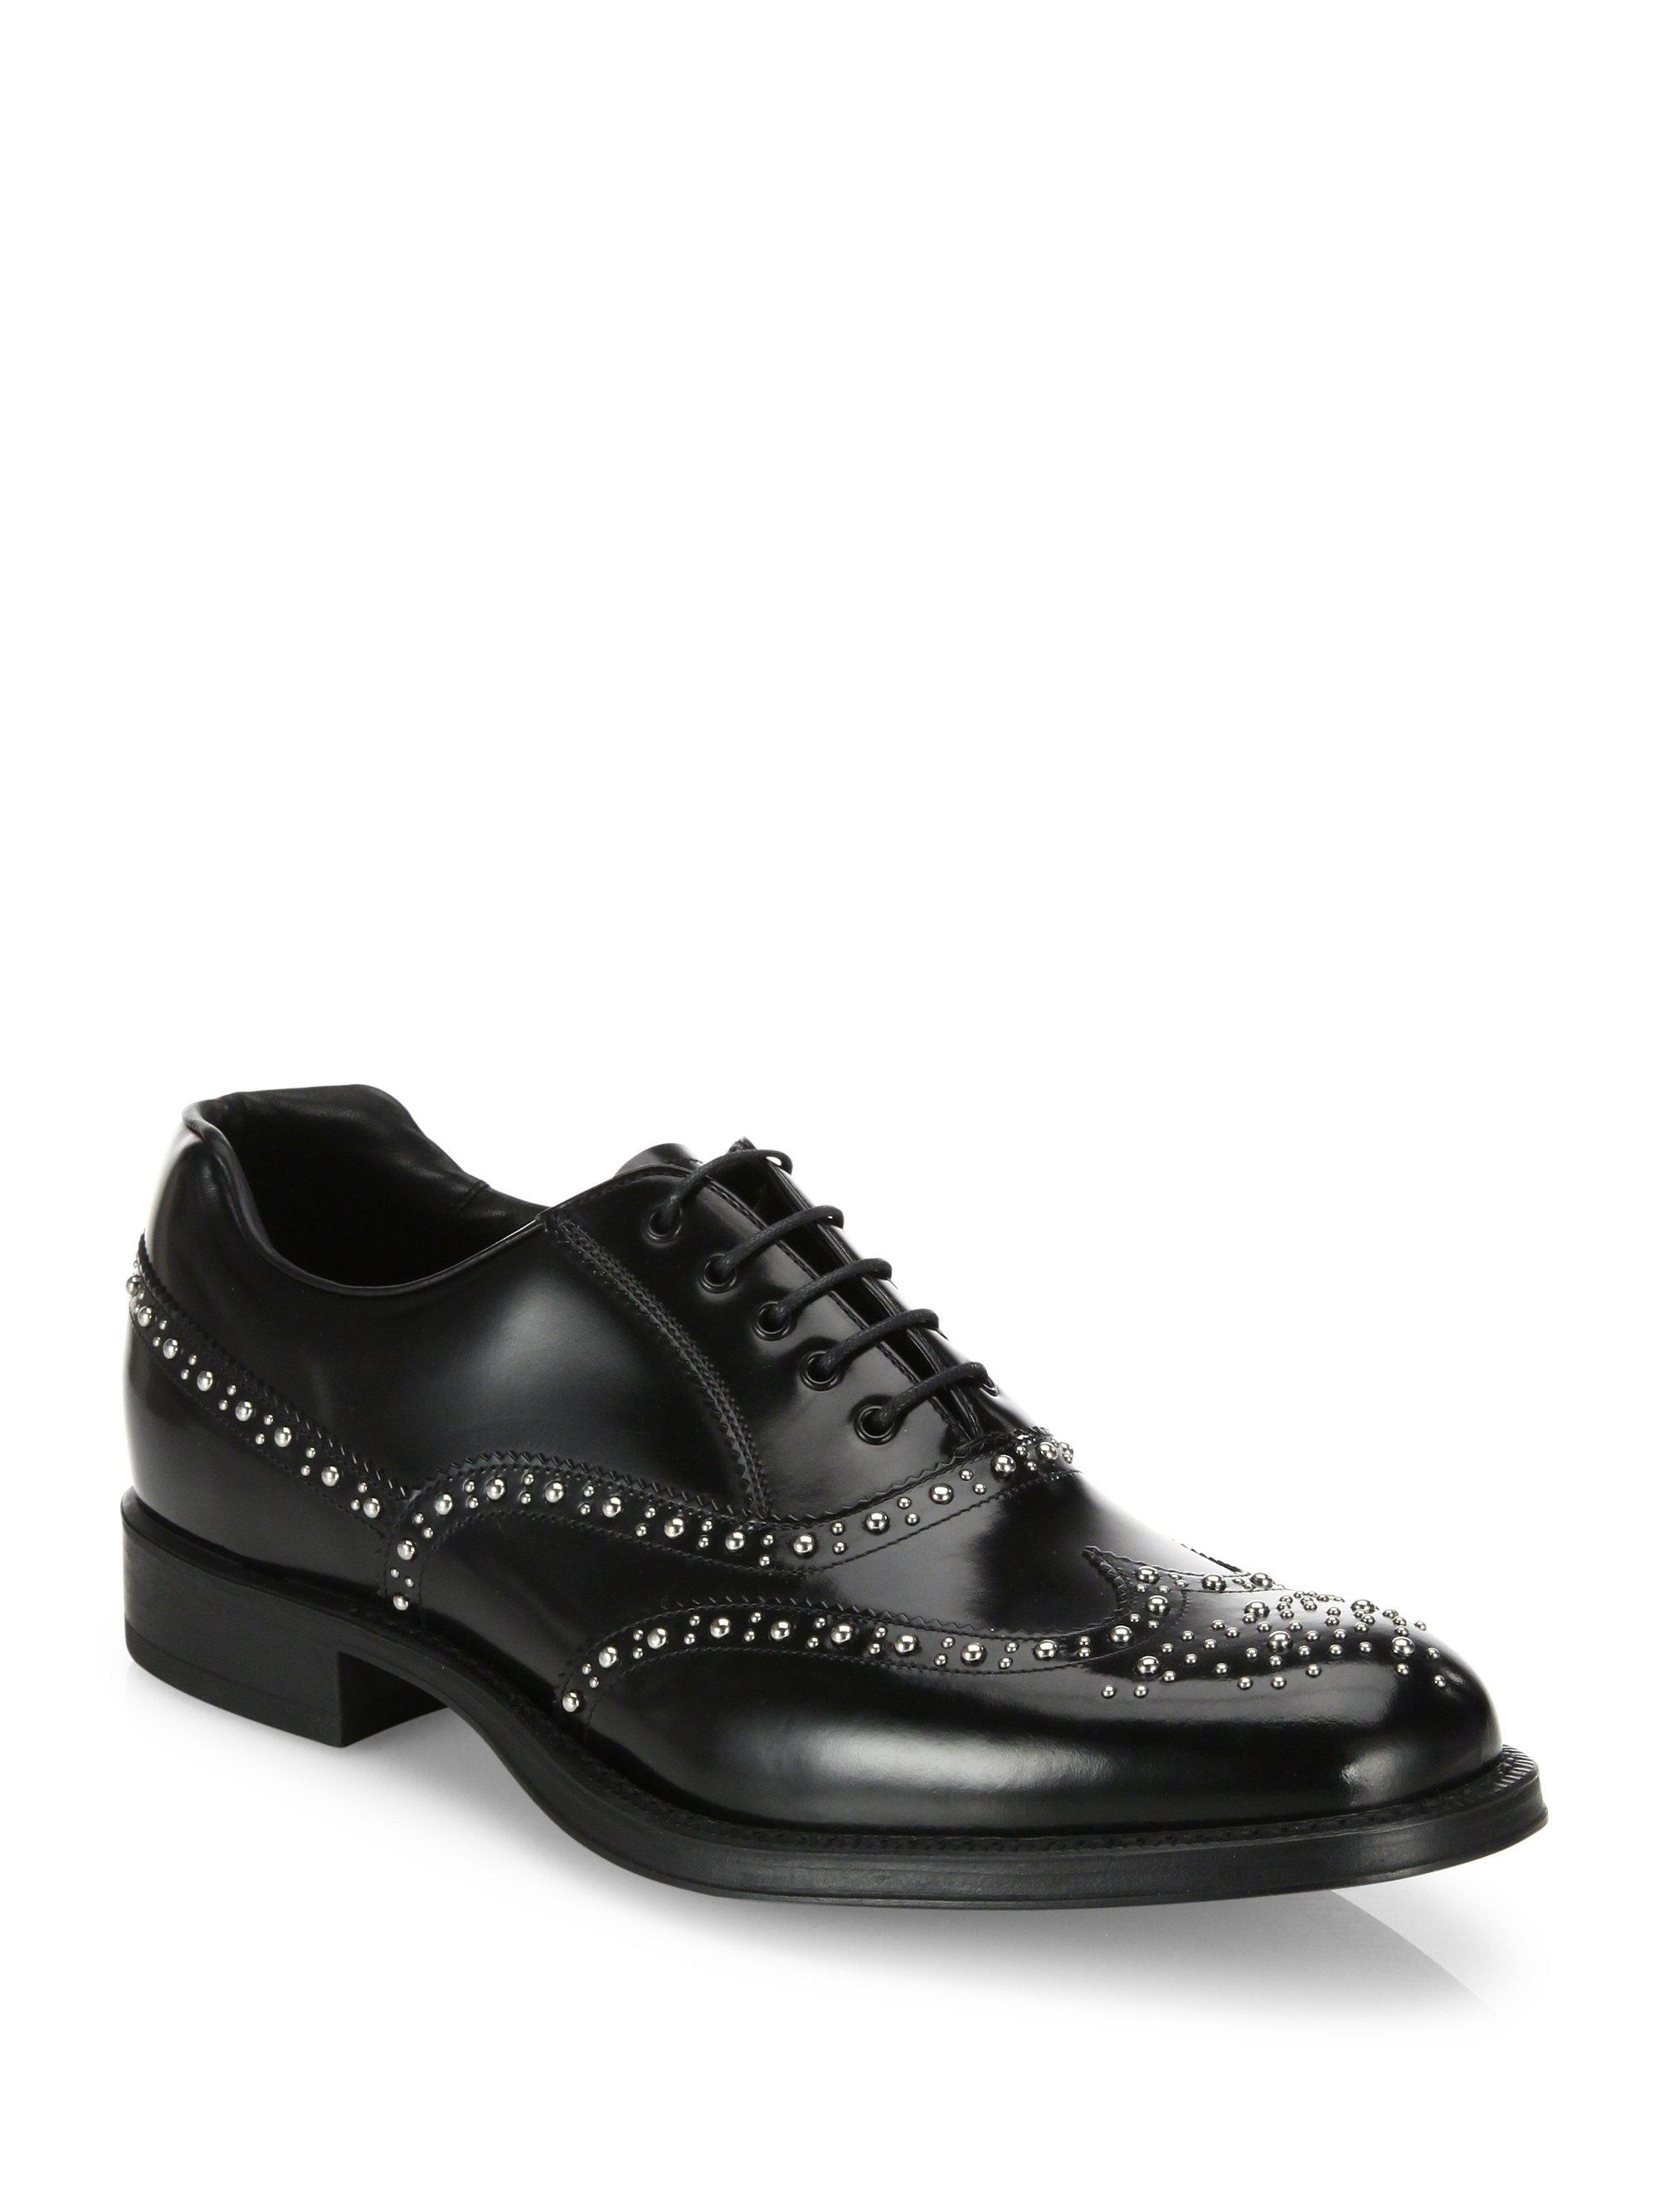 Prada. Men's Black Studded Leather Wingtip Oxfords